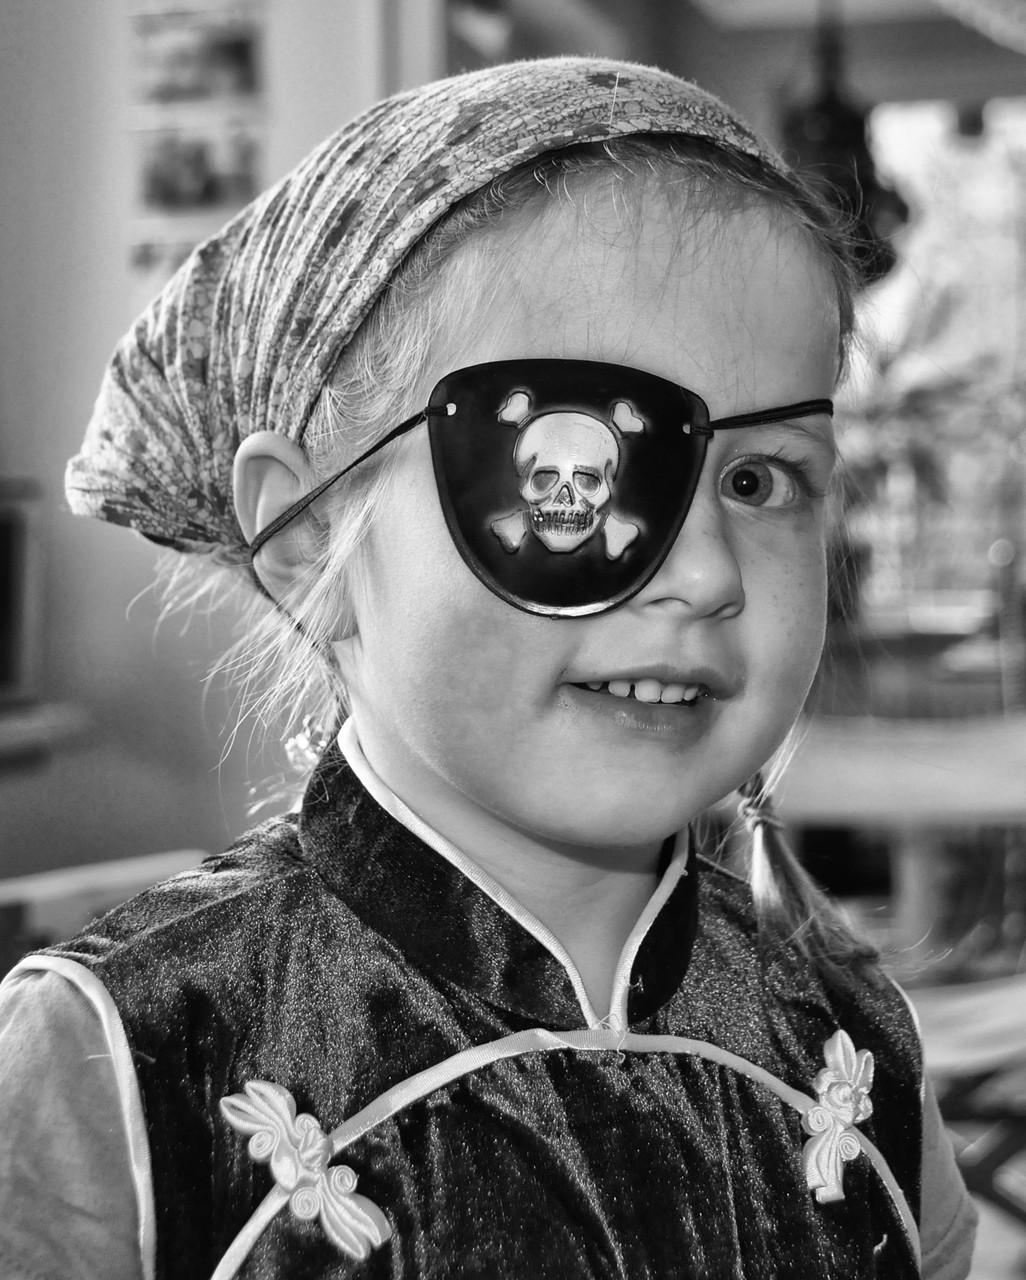 Piratenfrau